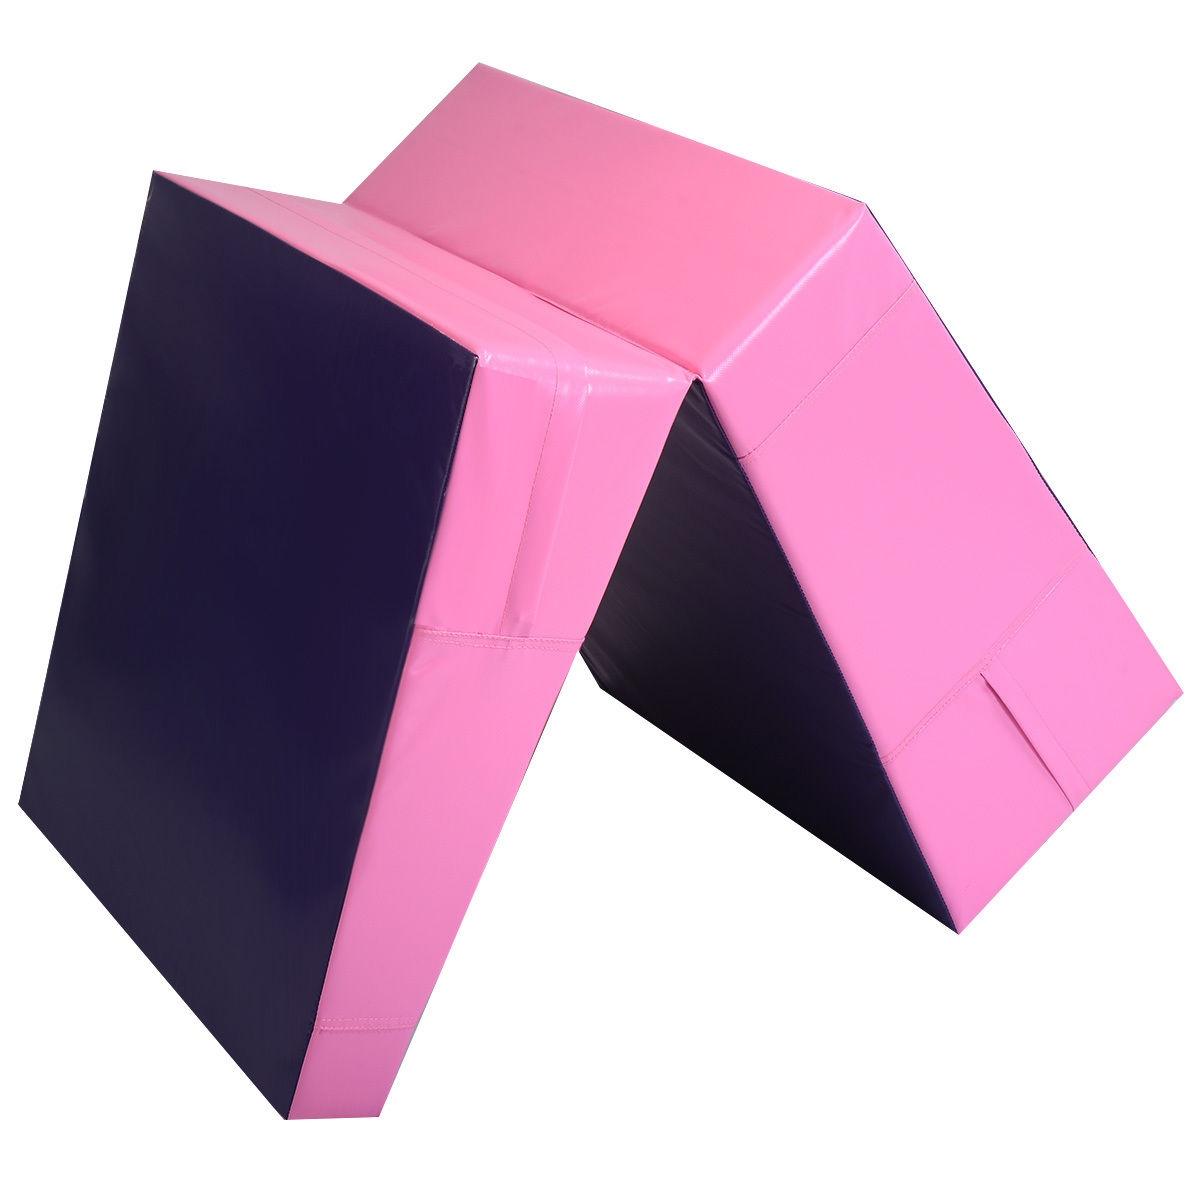 Folding Incline Tumbling Wedge Gymnastics Mat